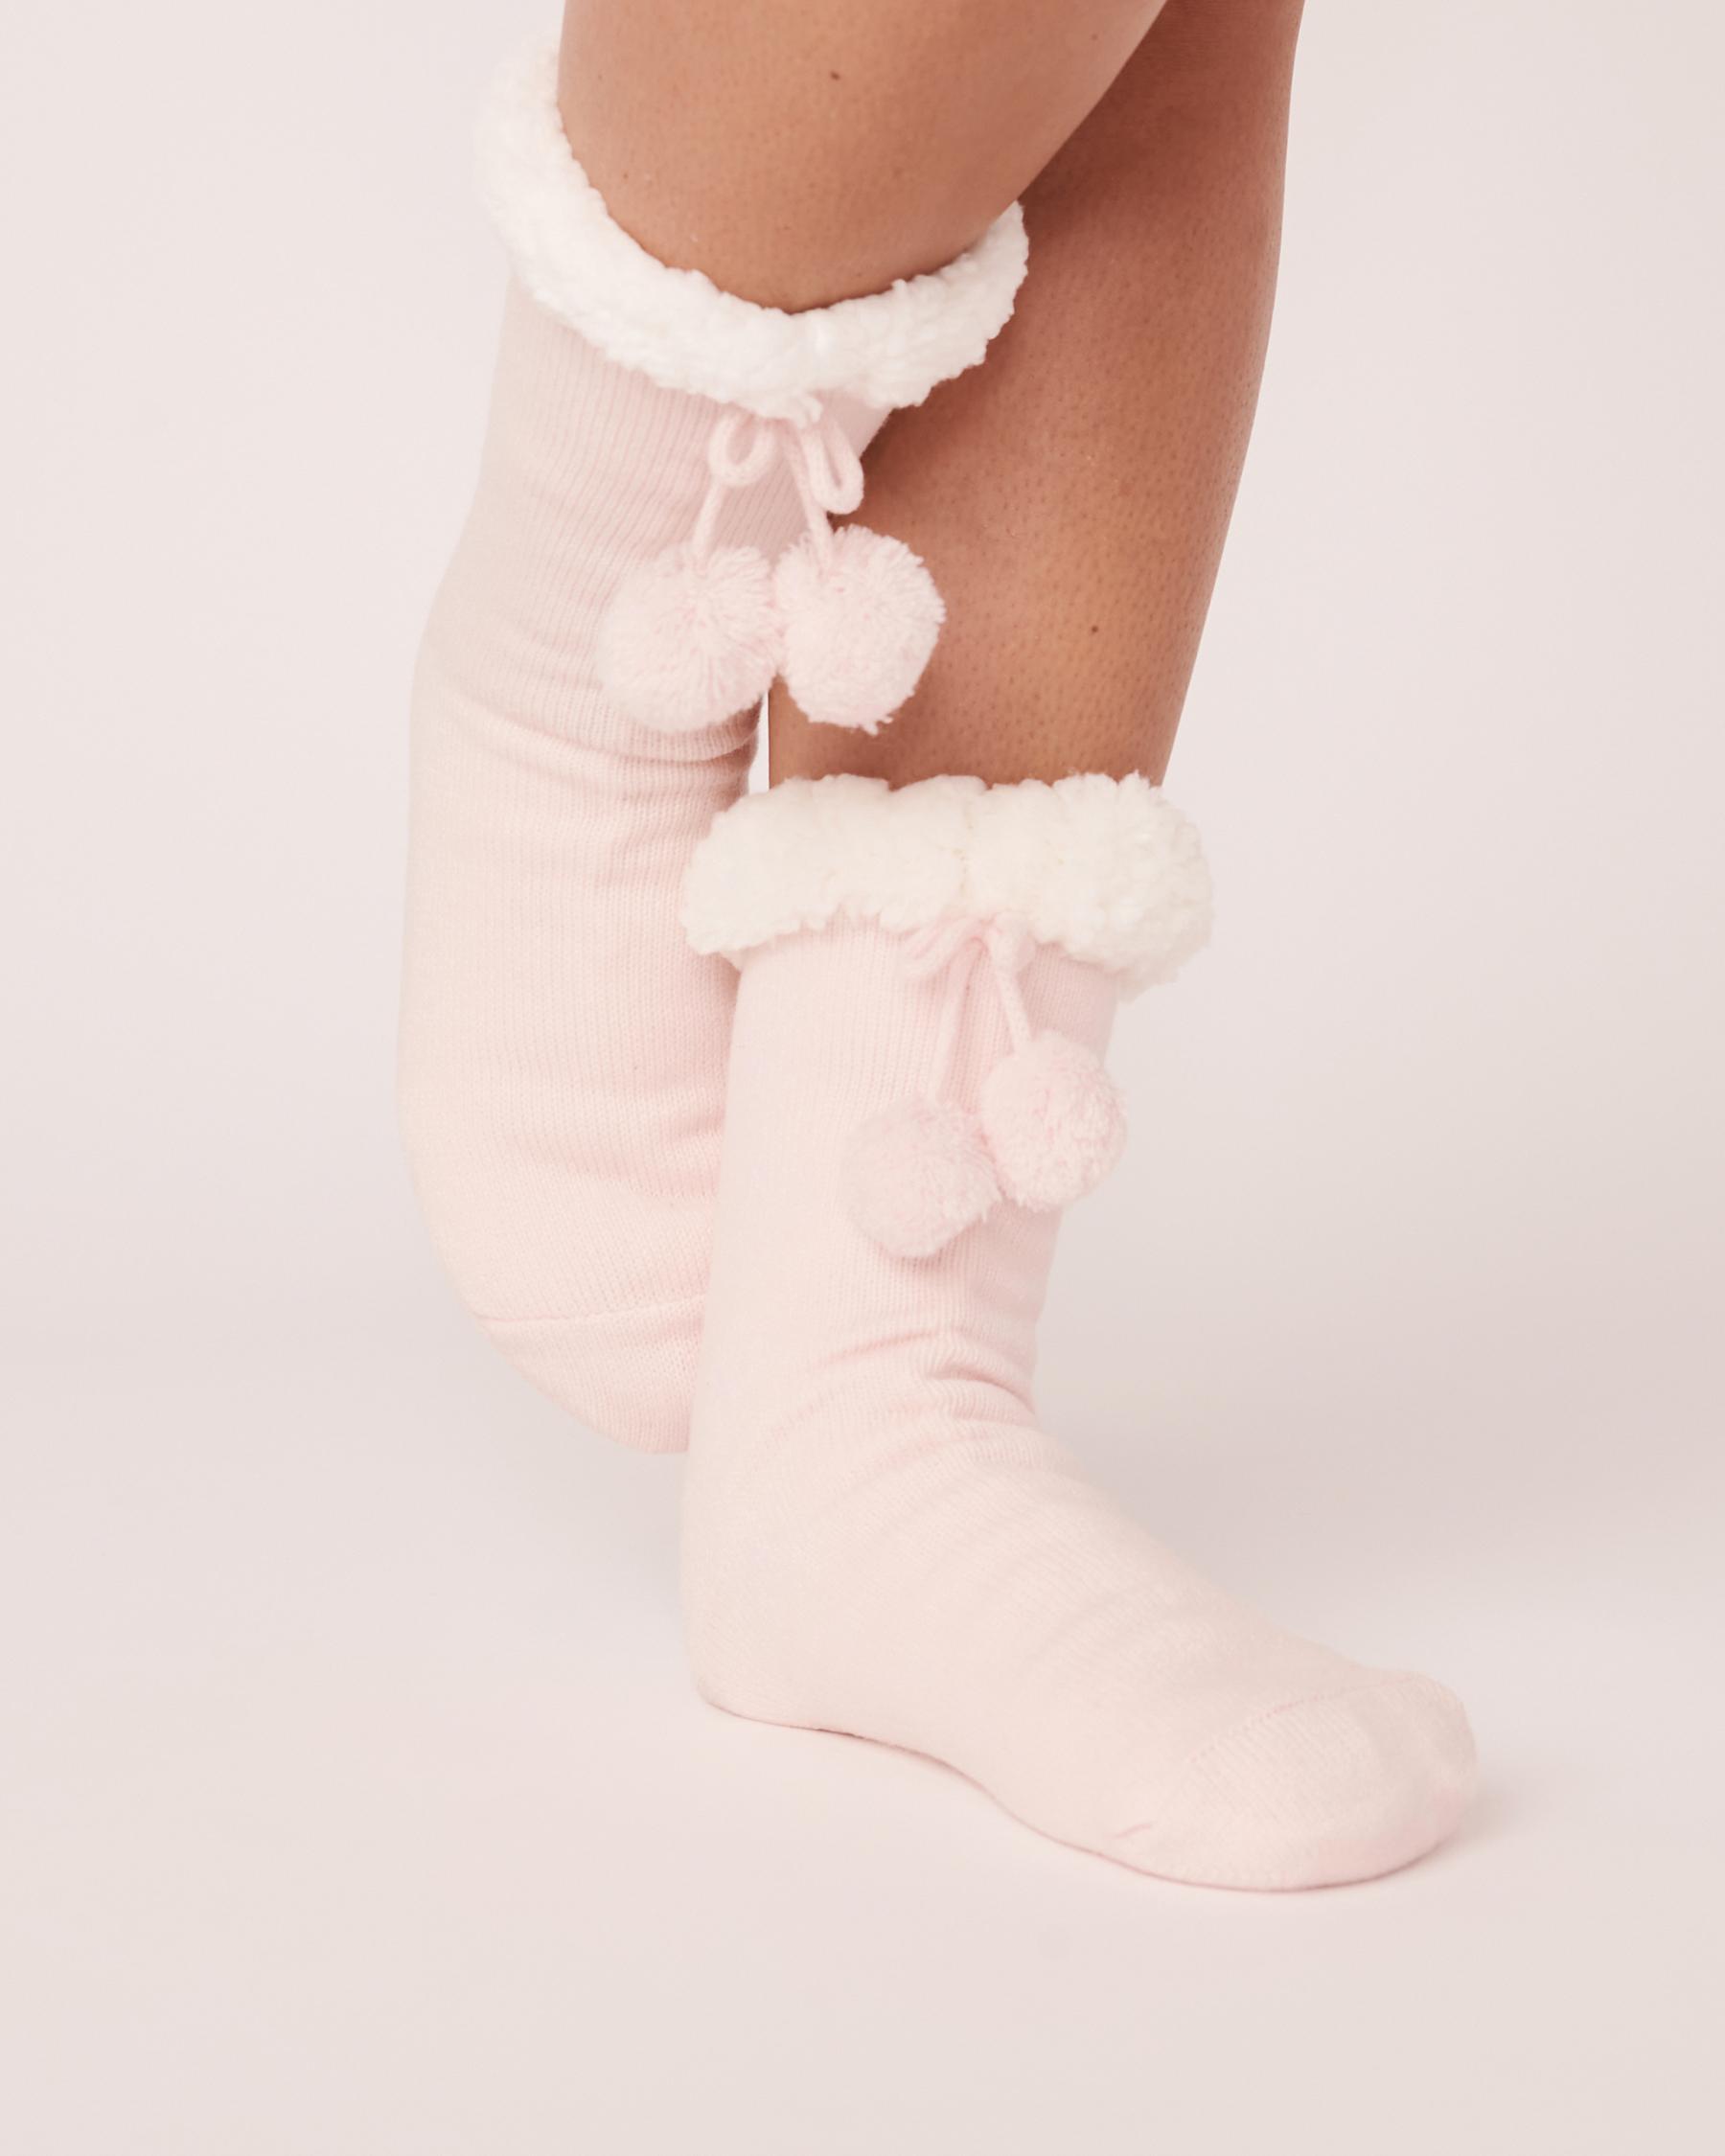 LA VIE EN ROSE Sherpa Pompom Socks Light pink 40700090 - View1